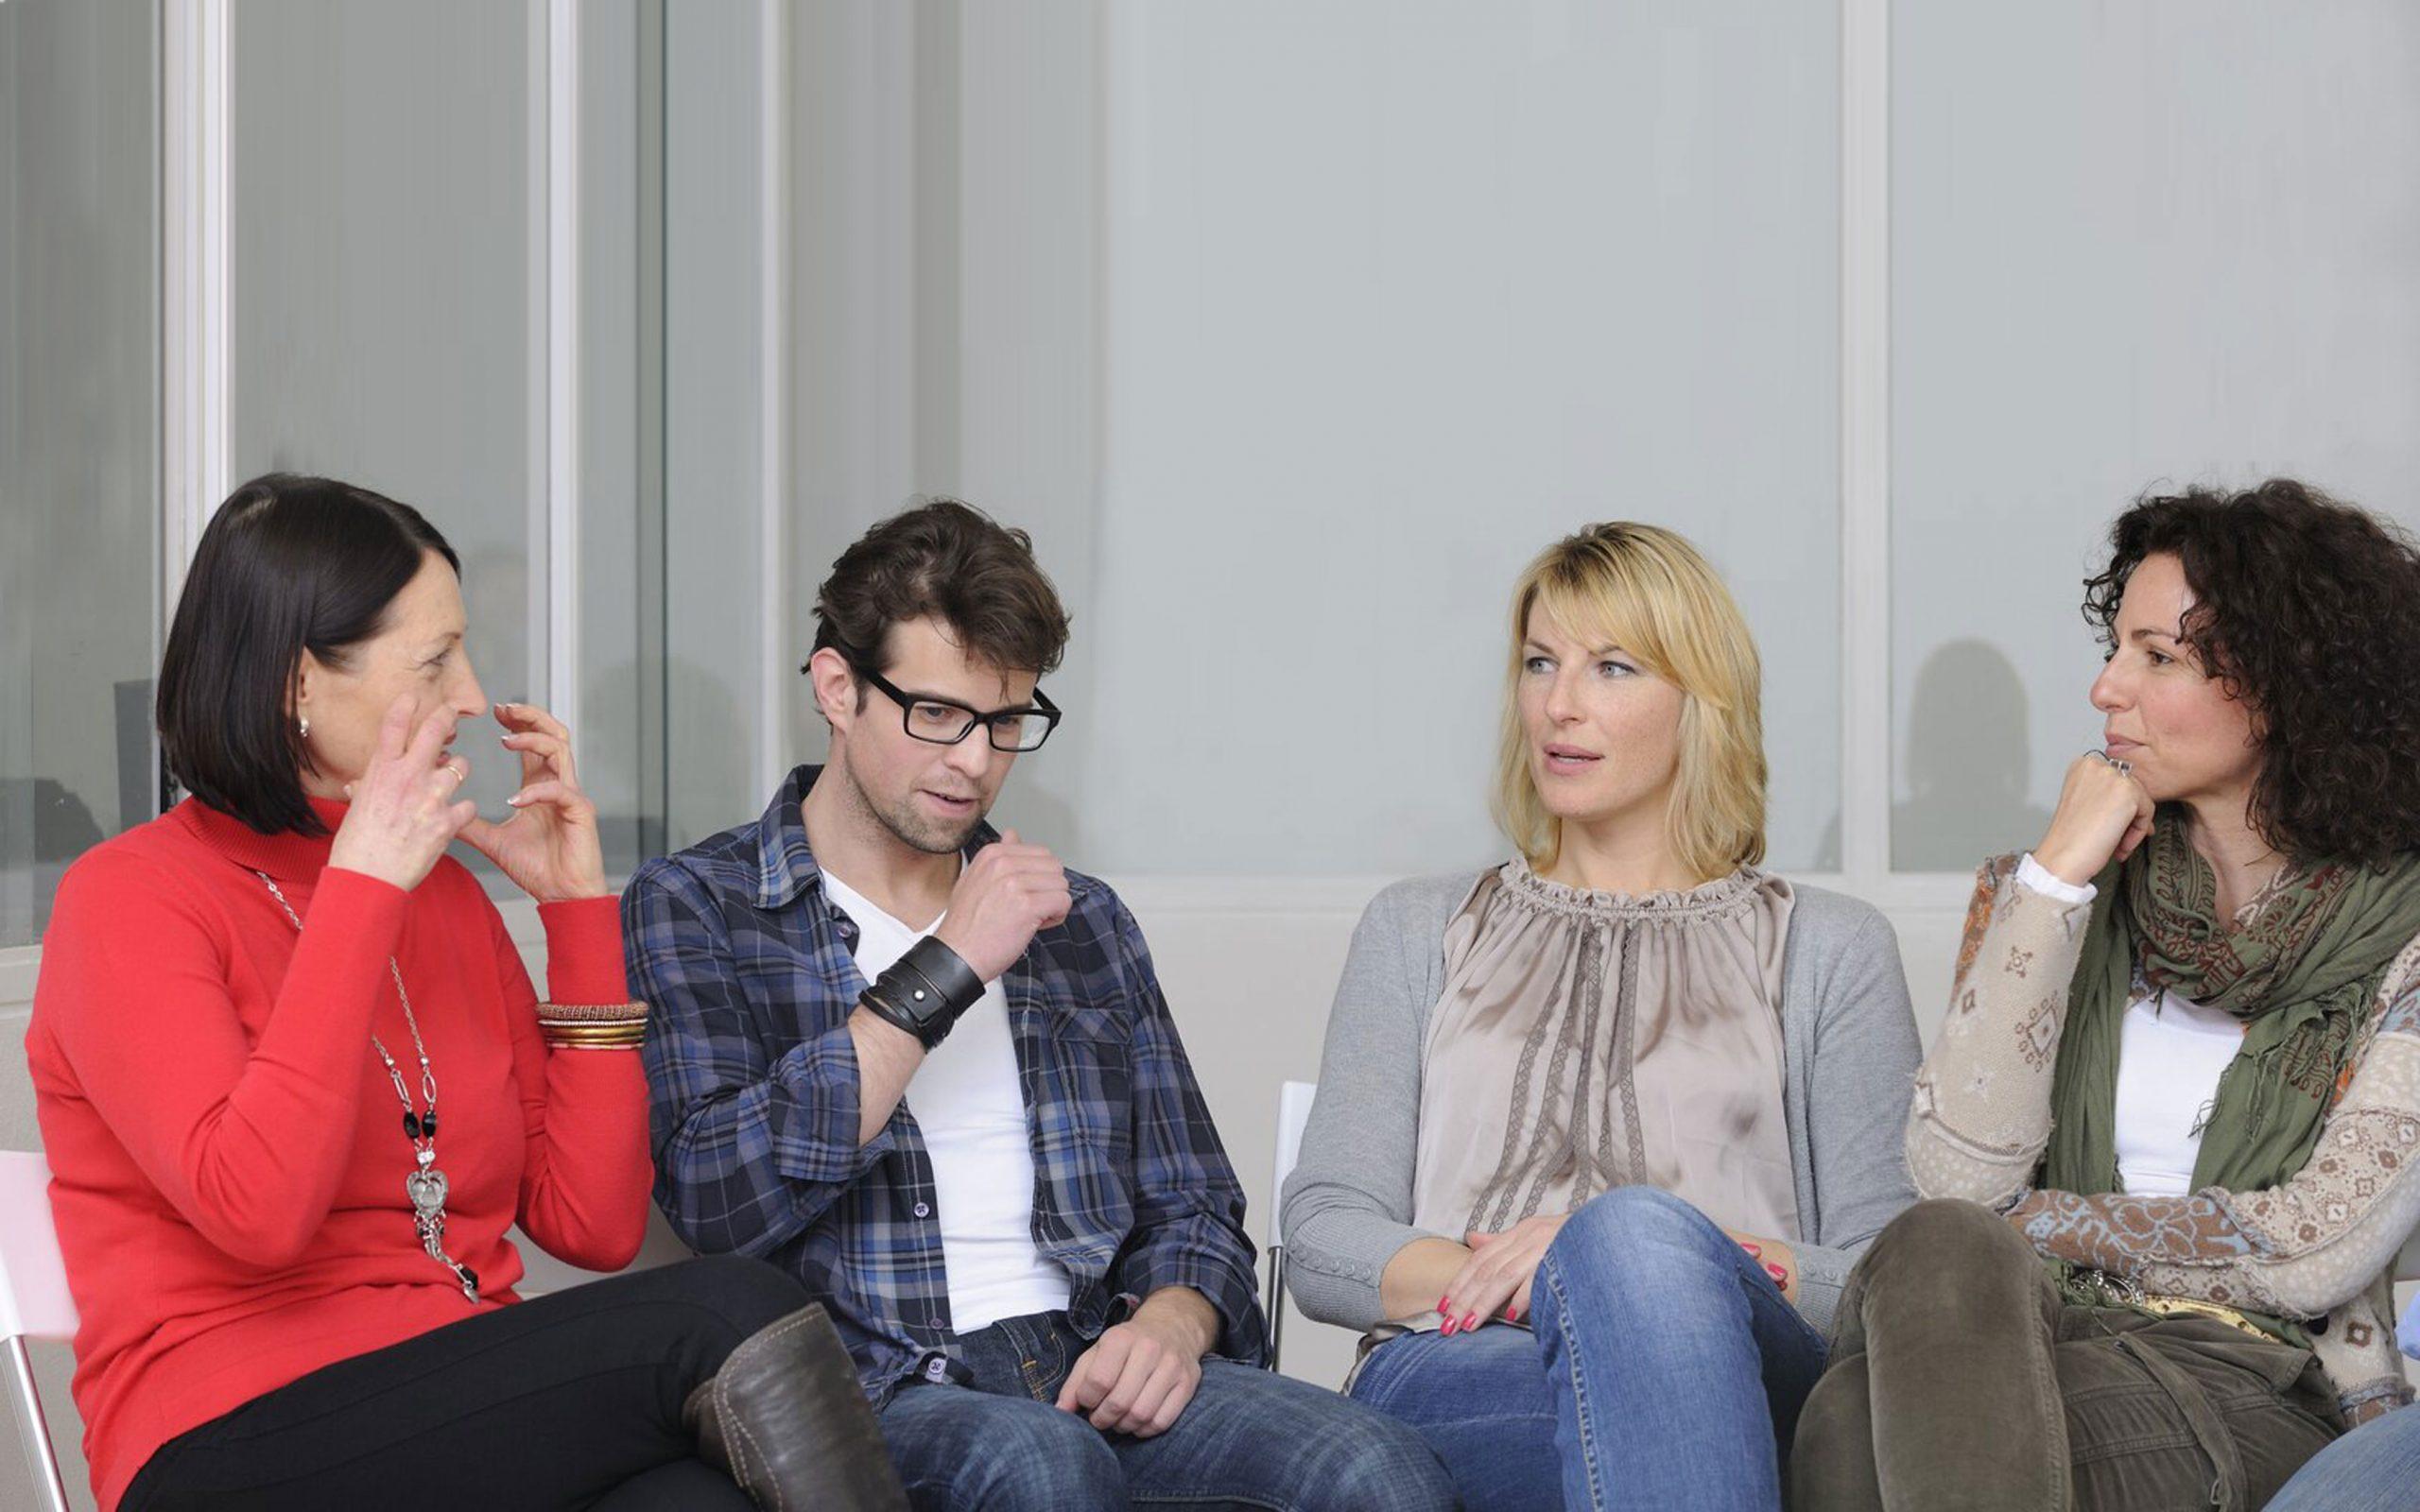 groep volwassenen in gesprek